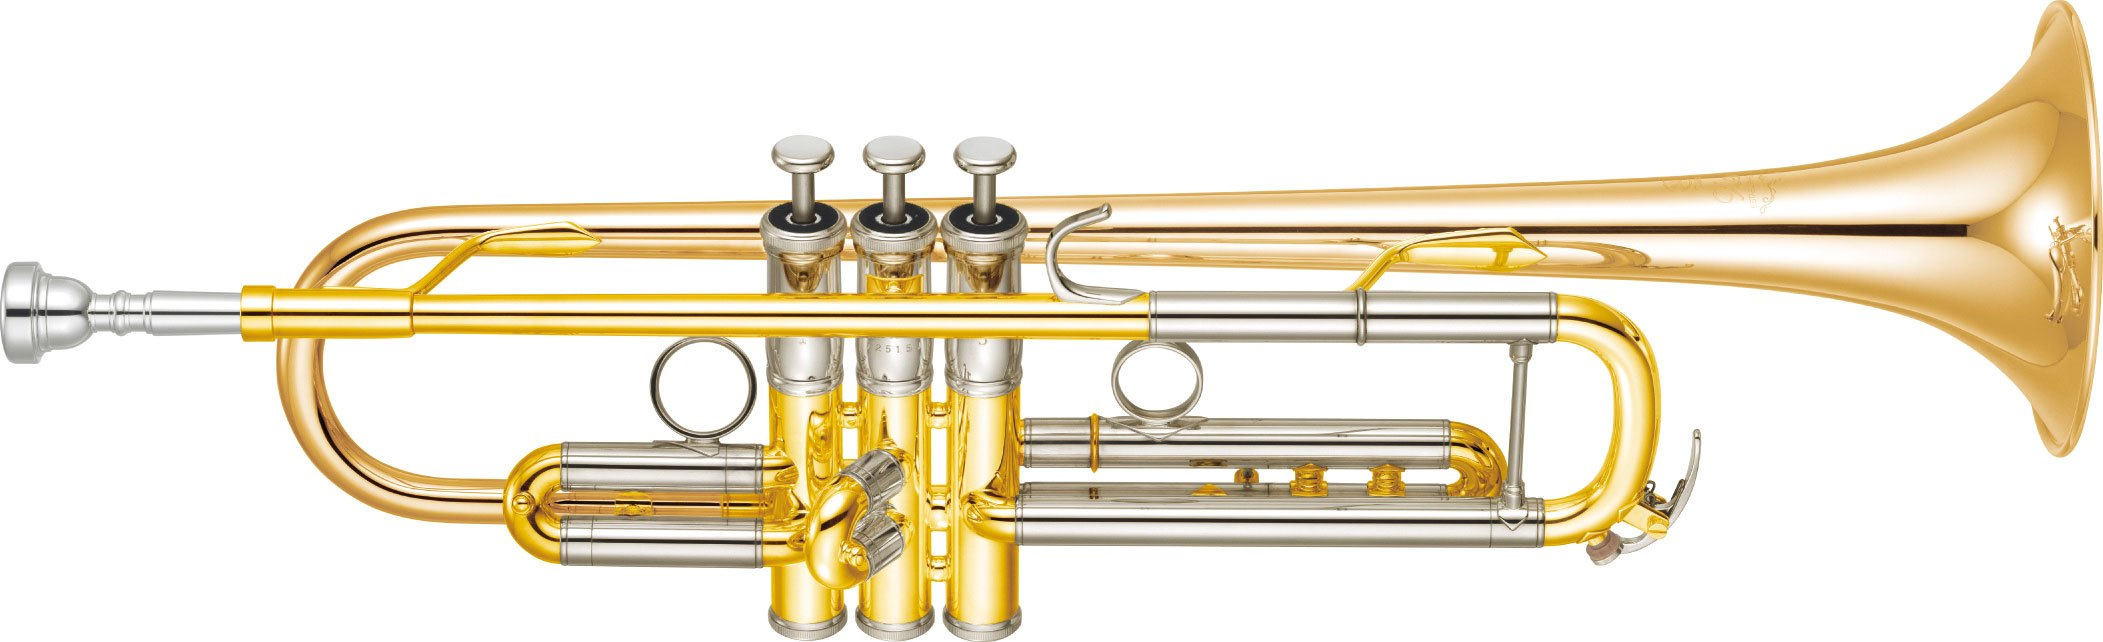 trompet-YTR-8335RG-yamaha